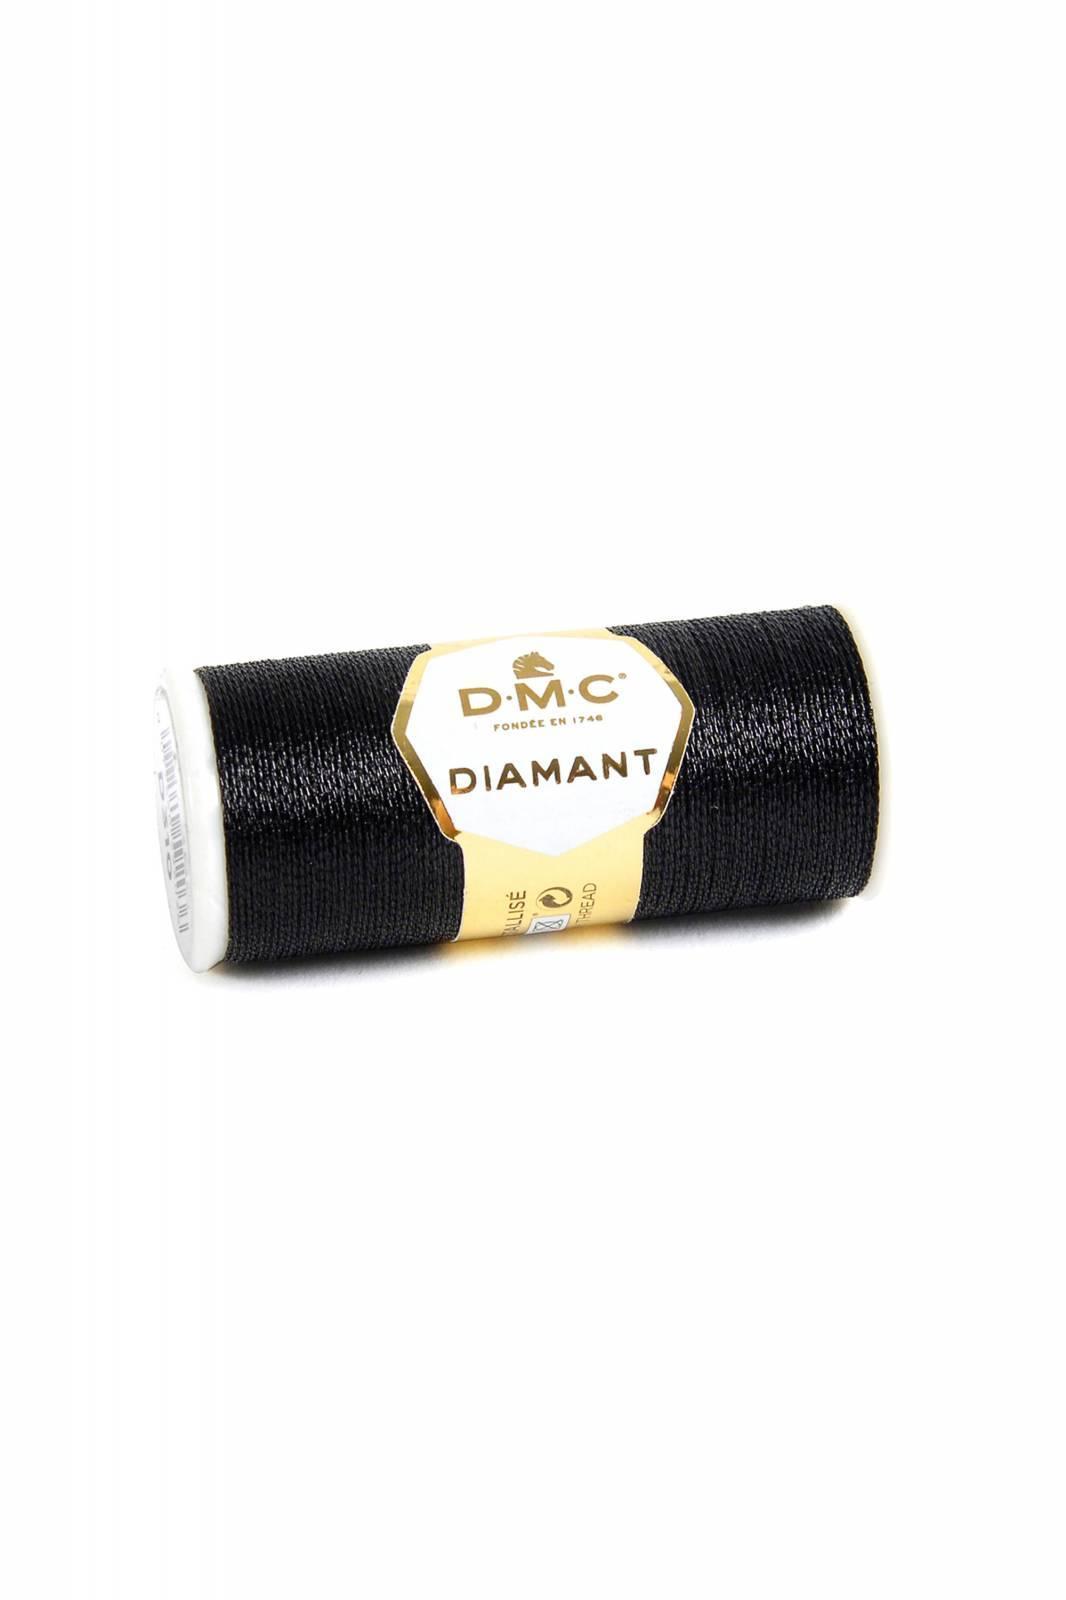 DMC Diamant cor 310 - BAÚ DA VOVÓ